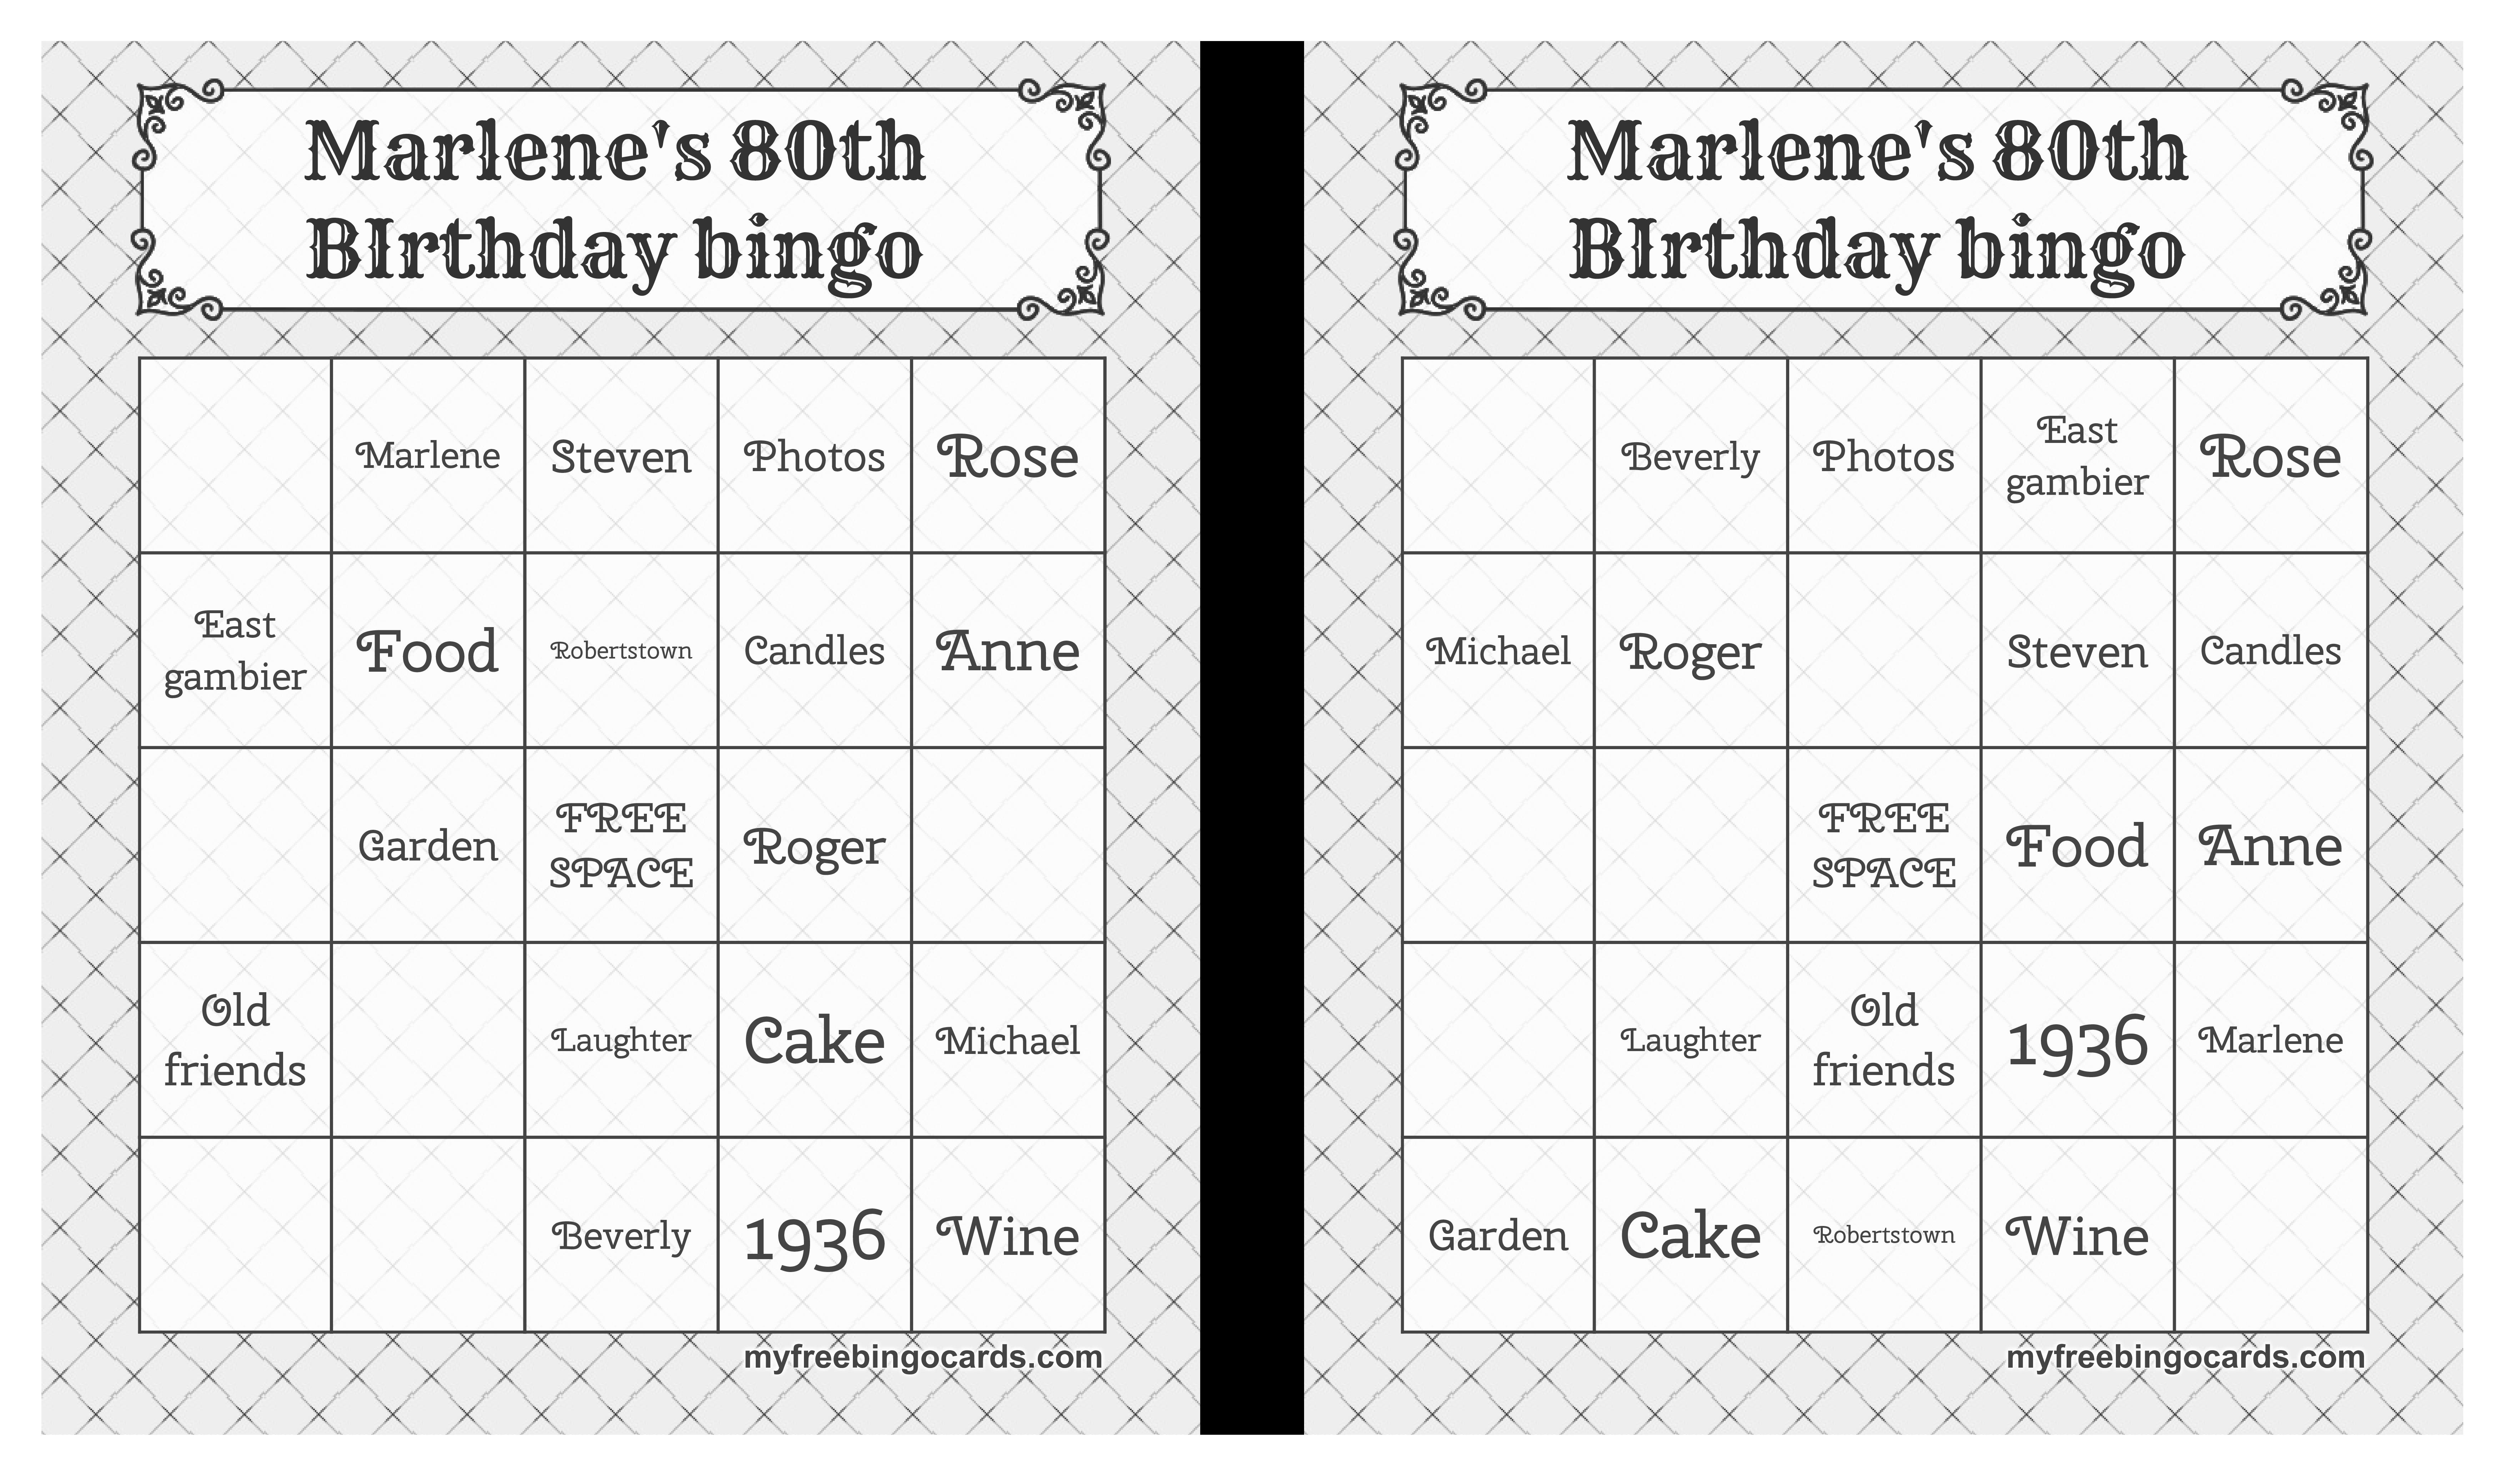 Printable Birthday Bingo Card  Templates at allbusinesstemplates With Regard To Blank Bingo Card Template Microsoft Word